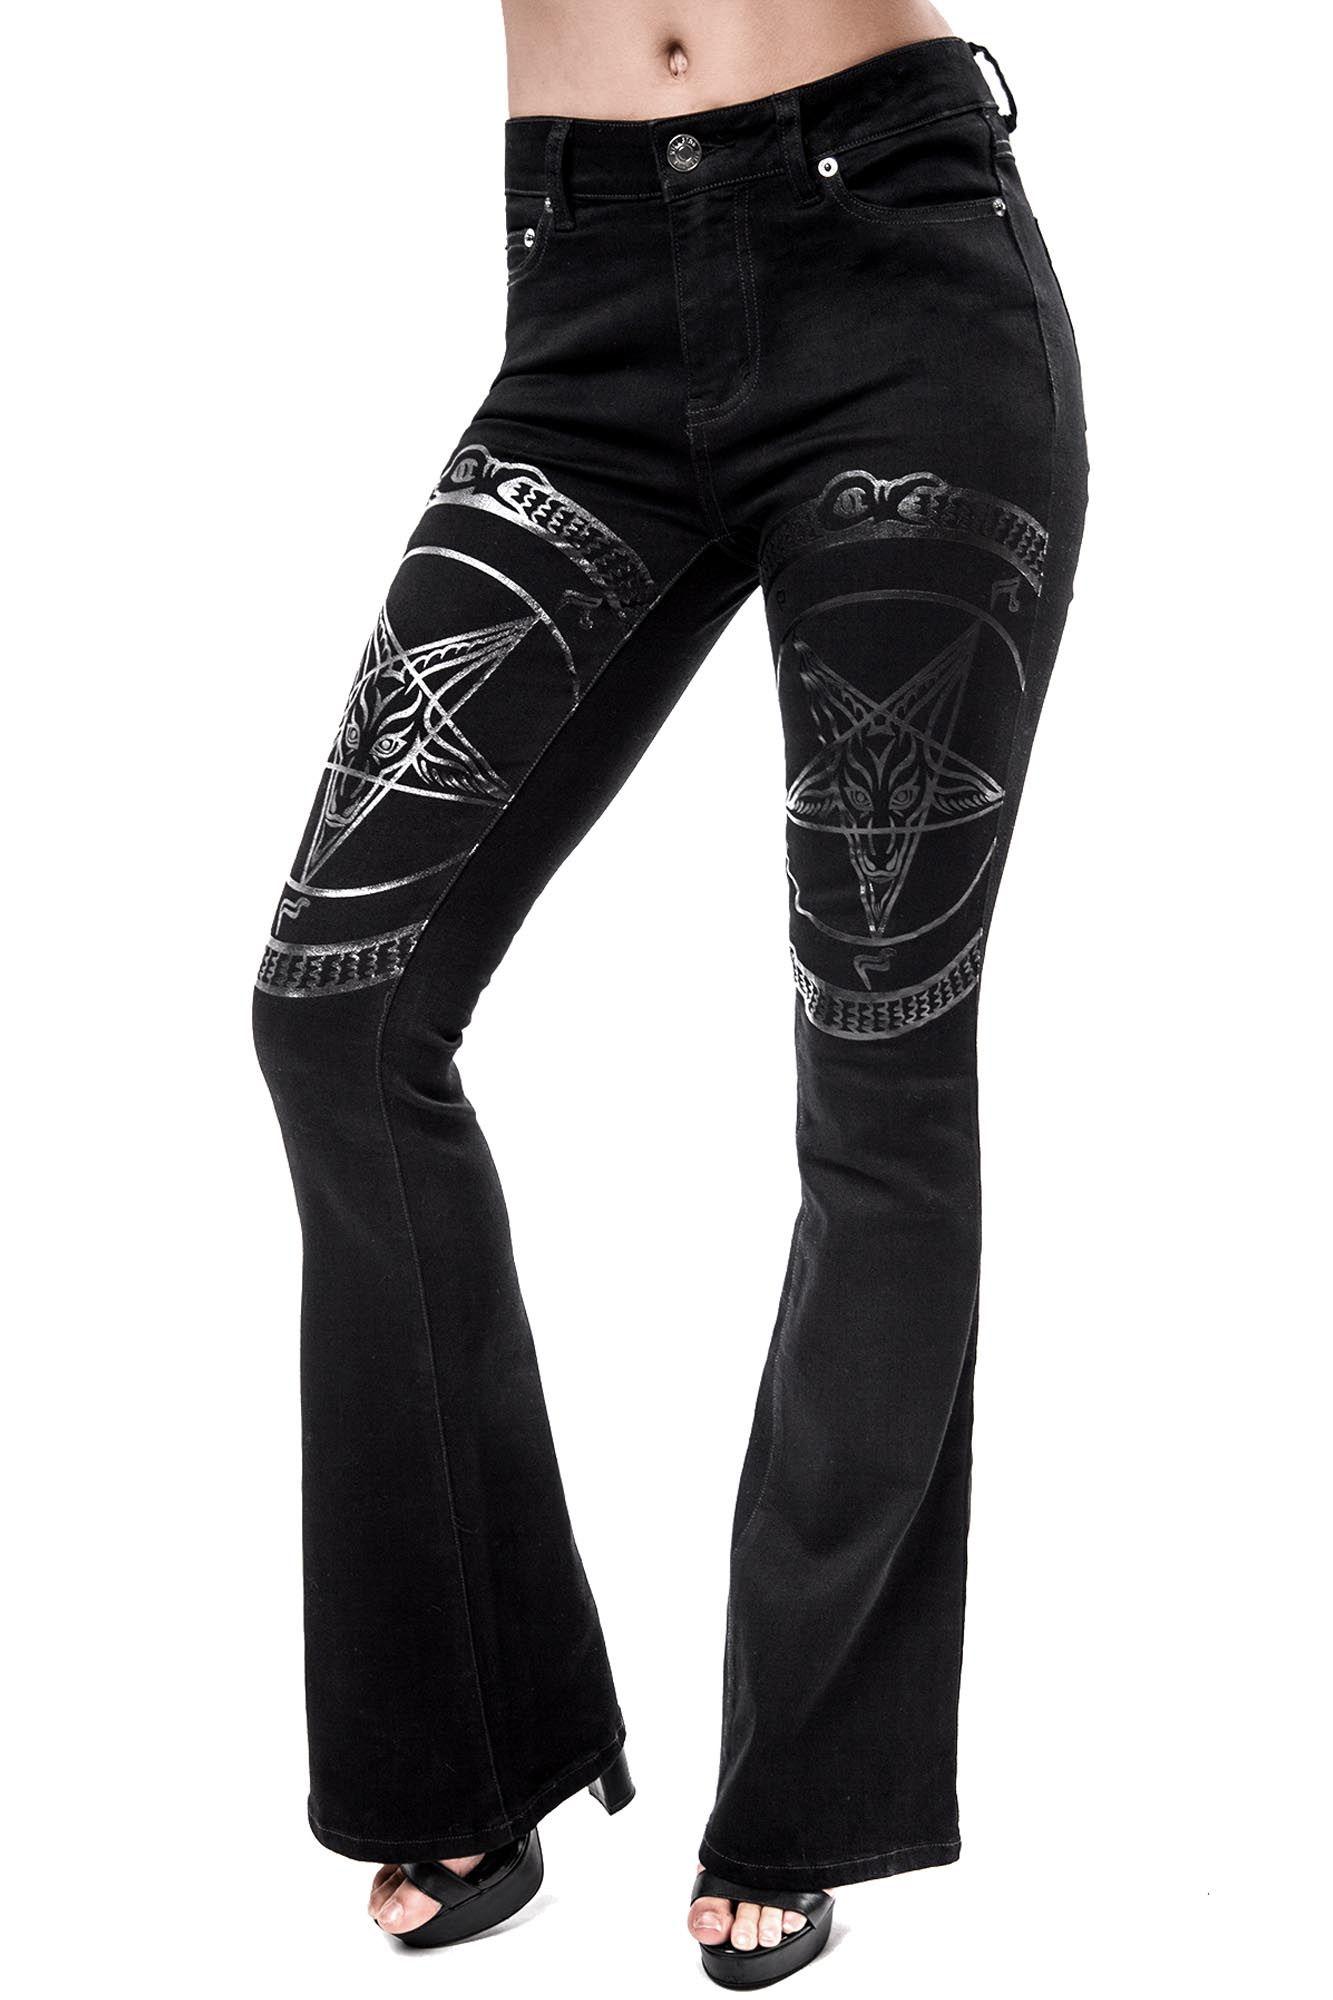 ks2243_pantalon-gothique-glam-rock-flares-hell-hound